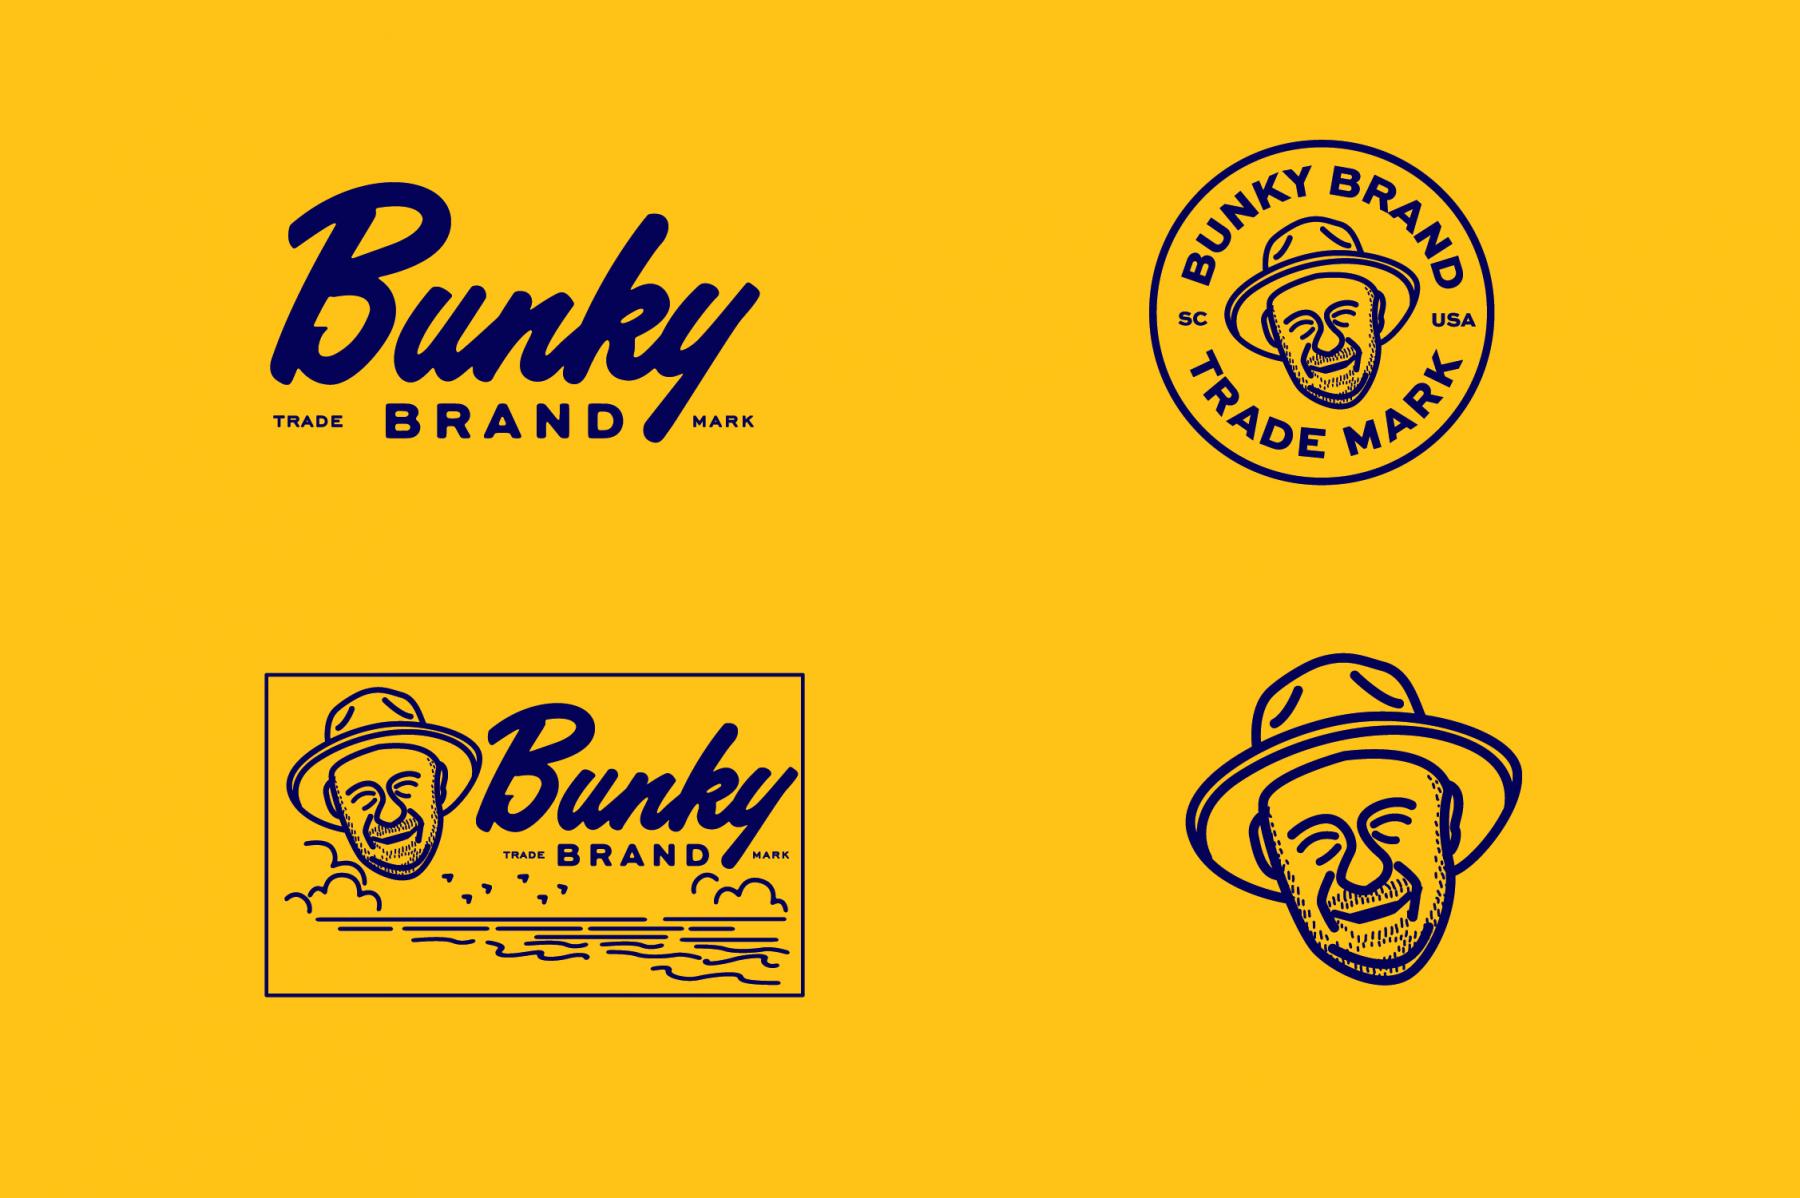 Bunky Brand